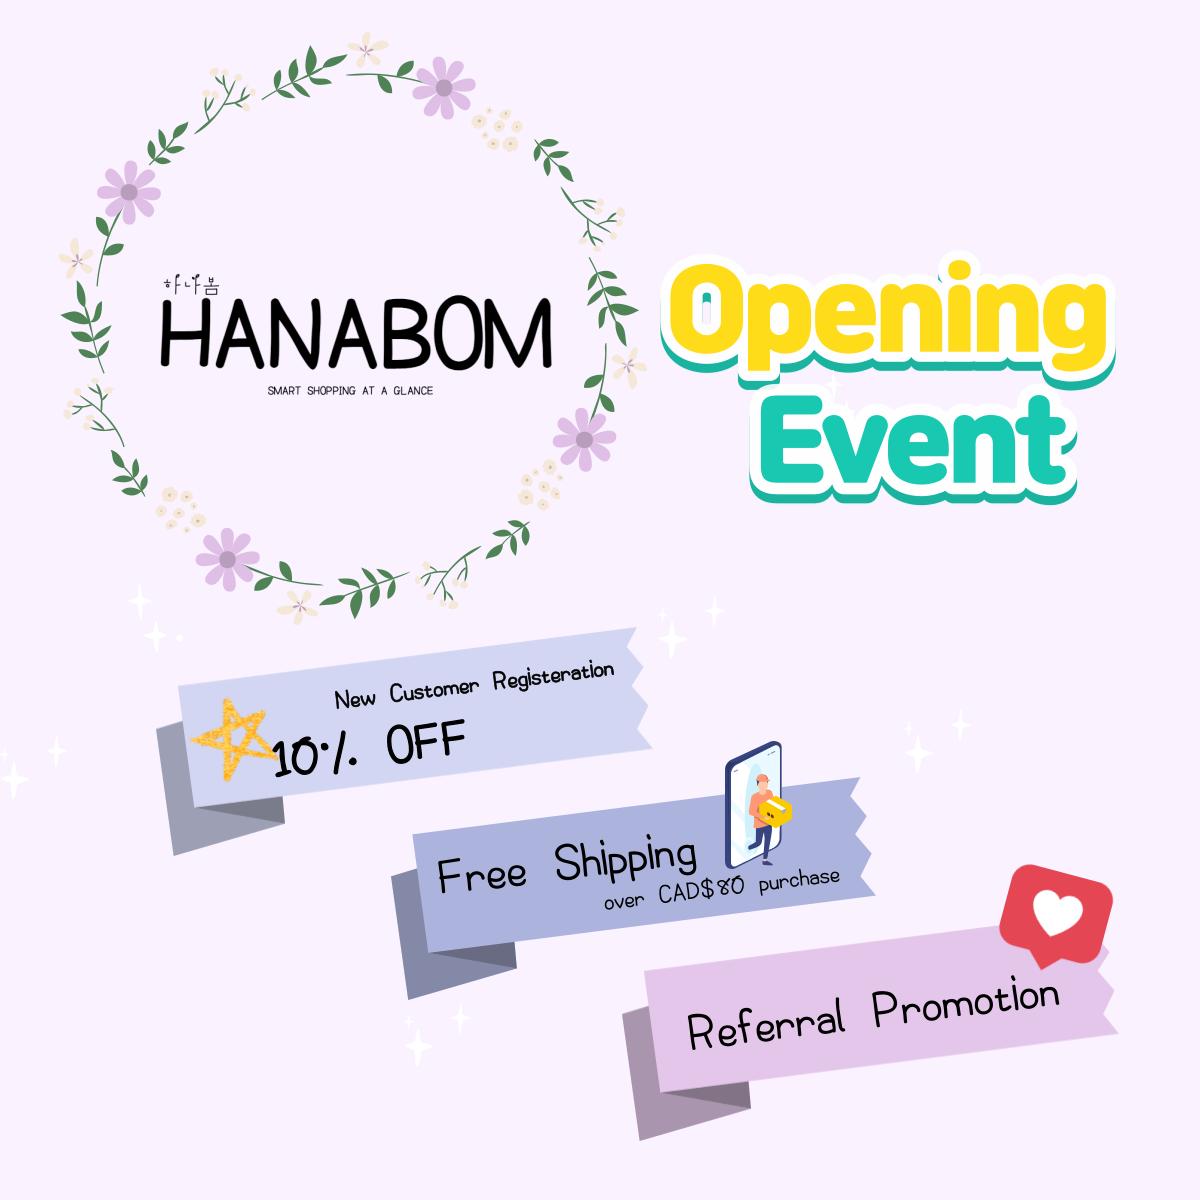 https://hanabom.ca/events